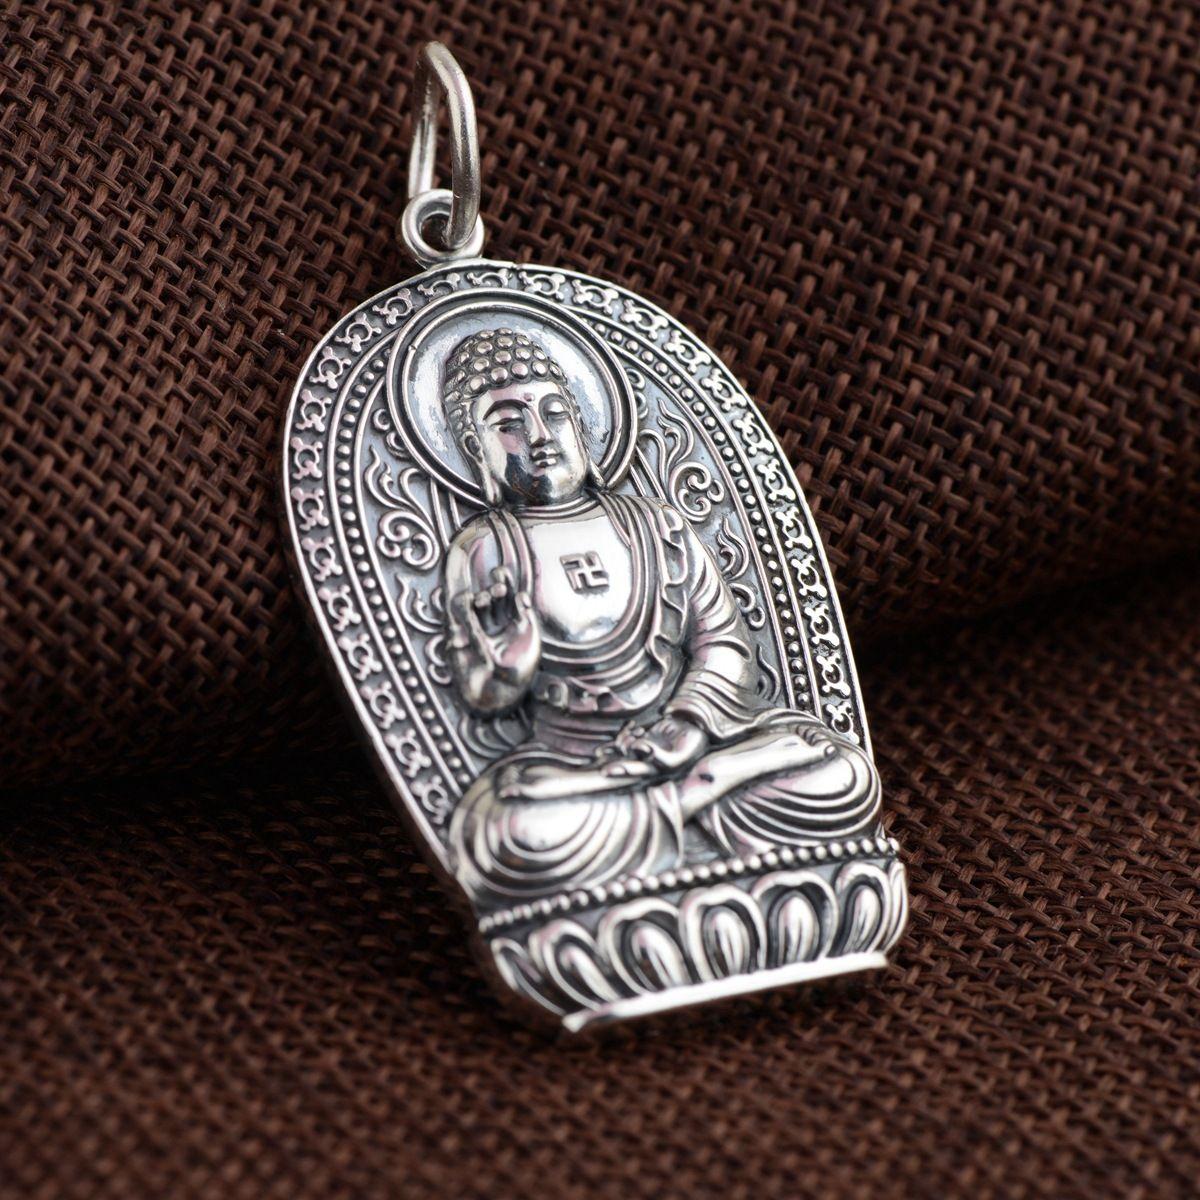 Real 925 silver pendants antique craft the Zodiac the Buddha the patron saint the new guarantee good luck pendants